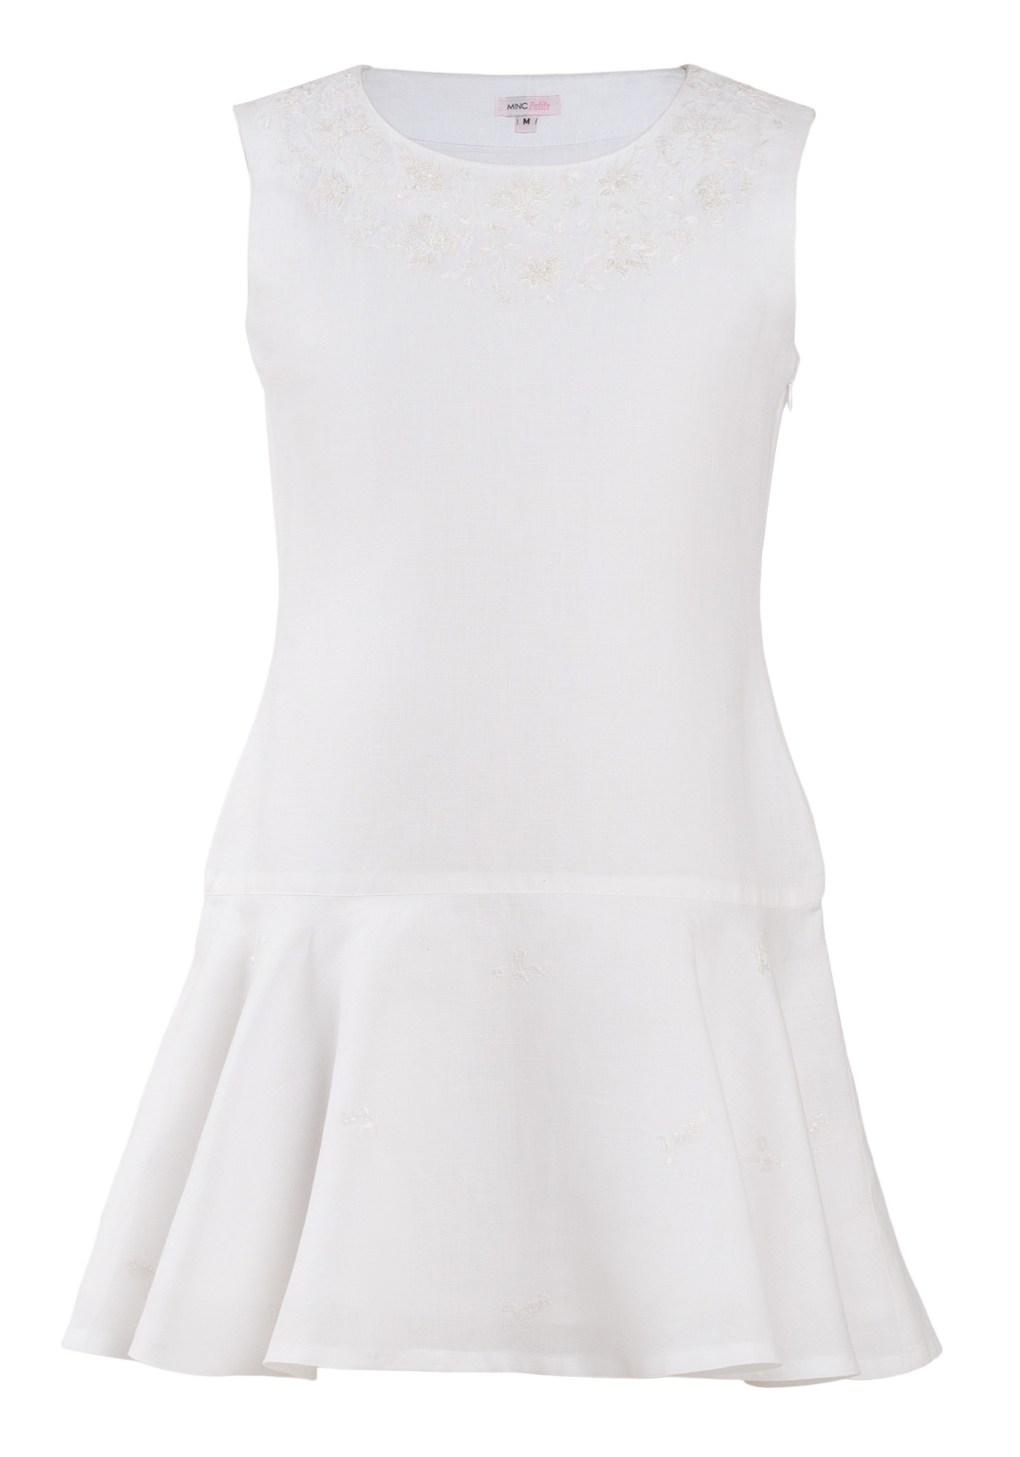 MINC Petite Preppy Girls Embroidered Dress in White Cotton Linen